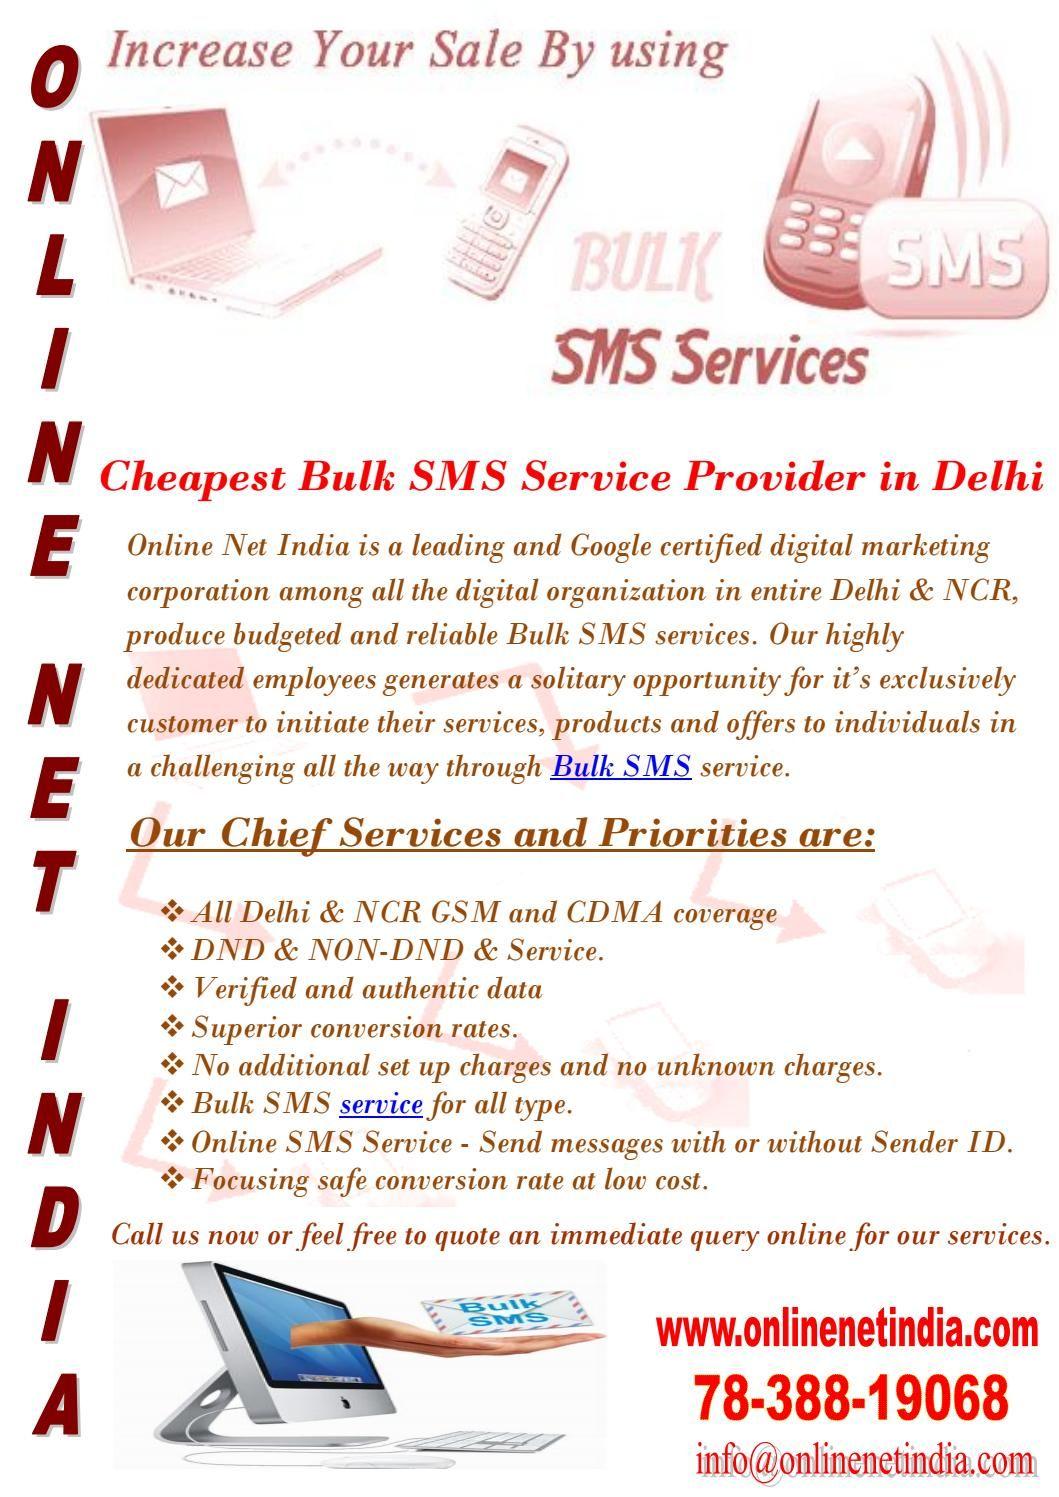 Cheapest Bulk SMS Service Provider in Delhi Sms, Sms